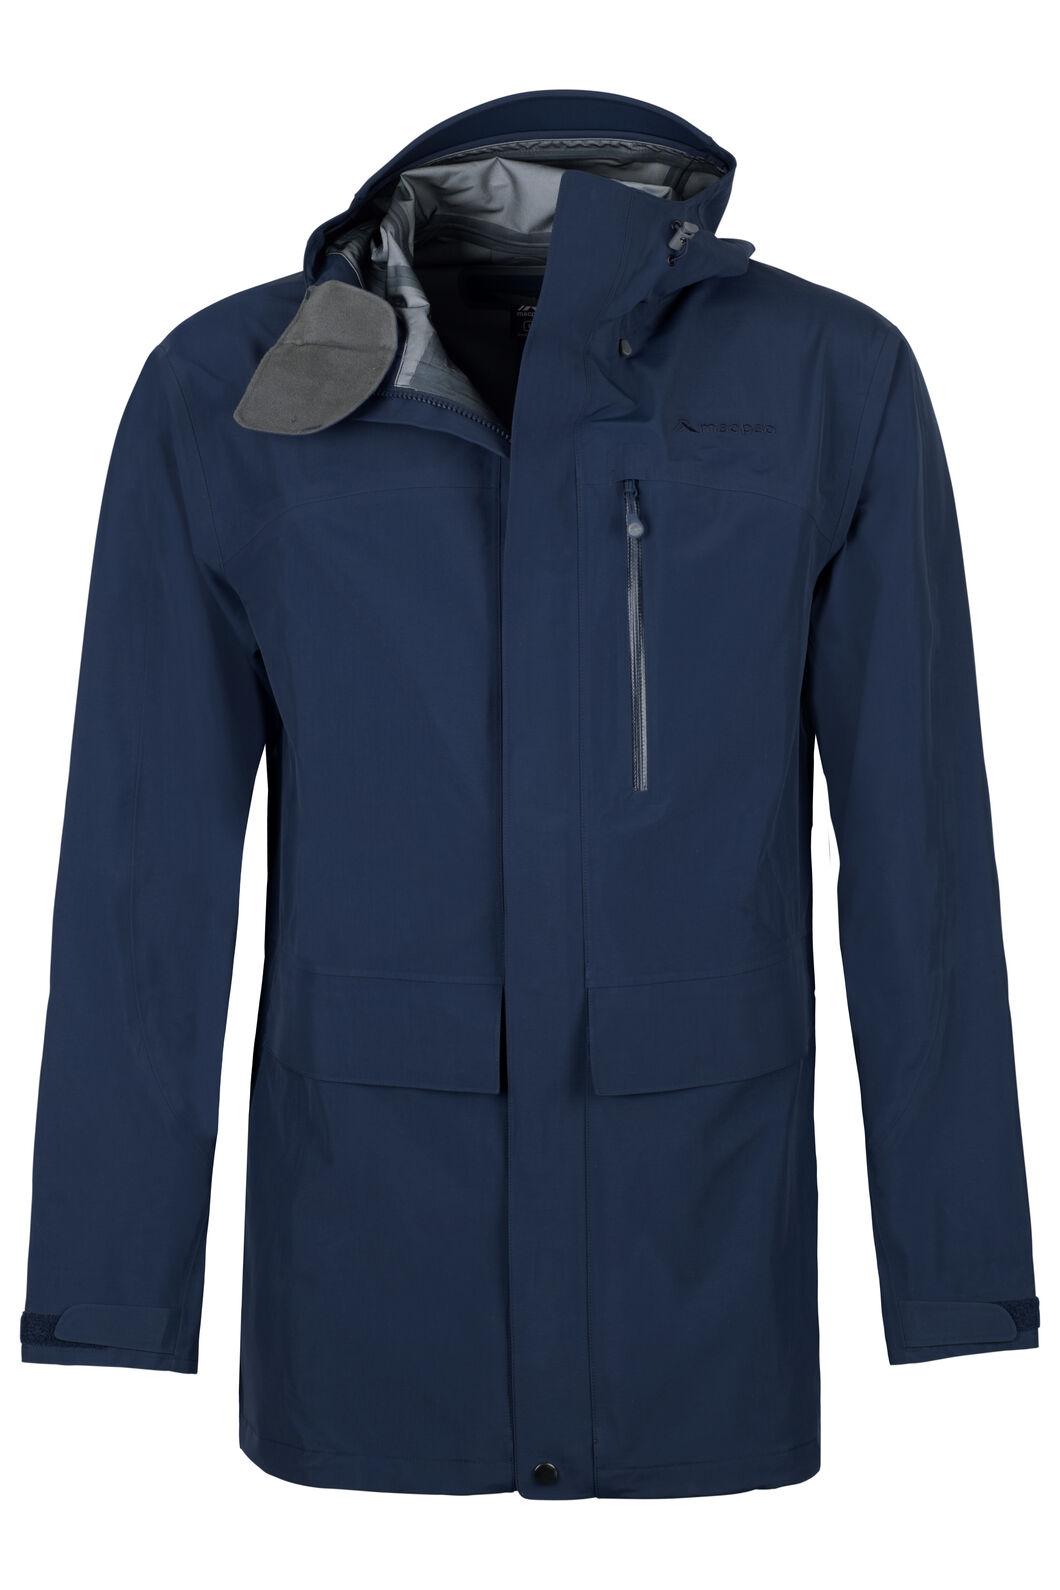 Resolution Pertex Shield® Long Rain Jacket - Men's, Black Iris, hi-res